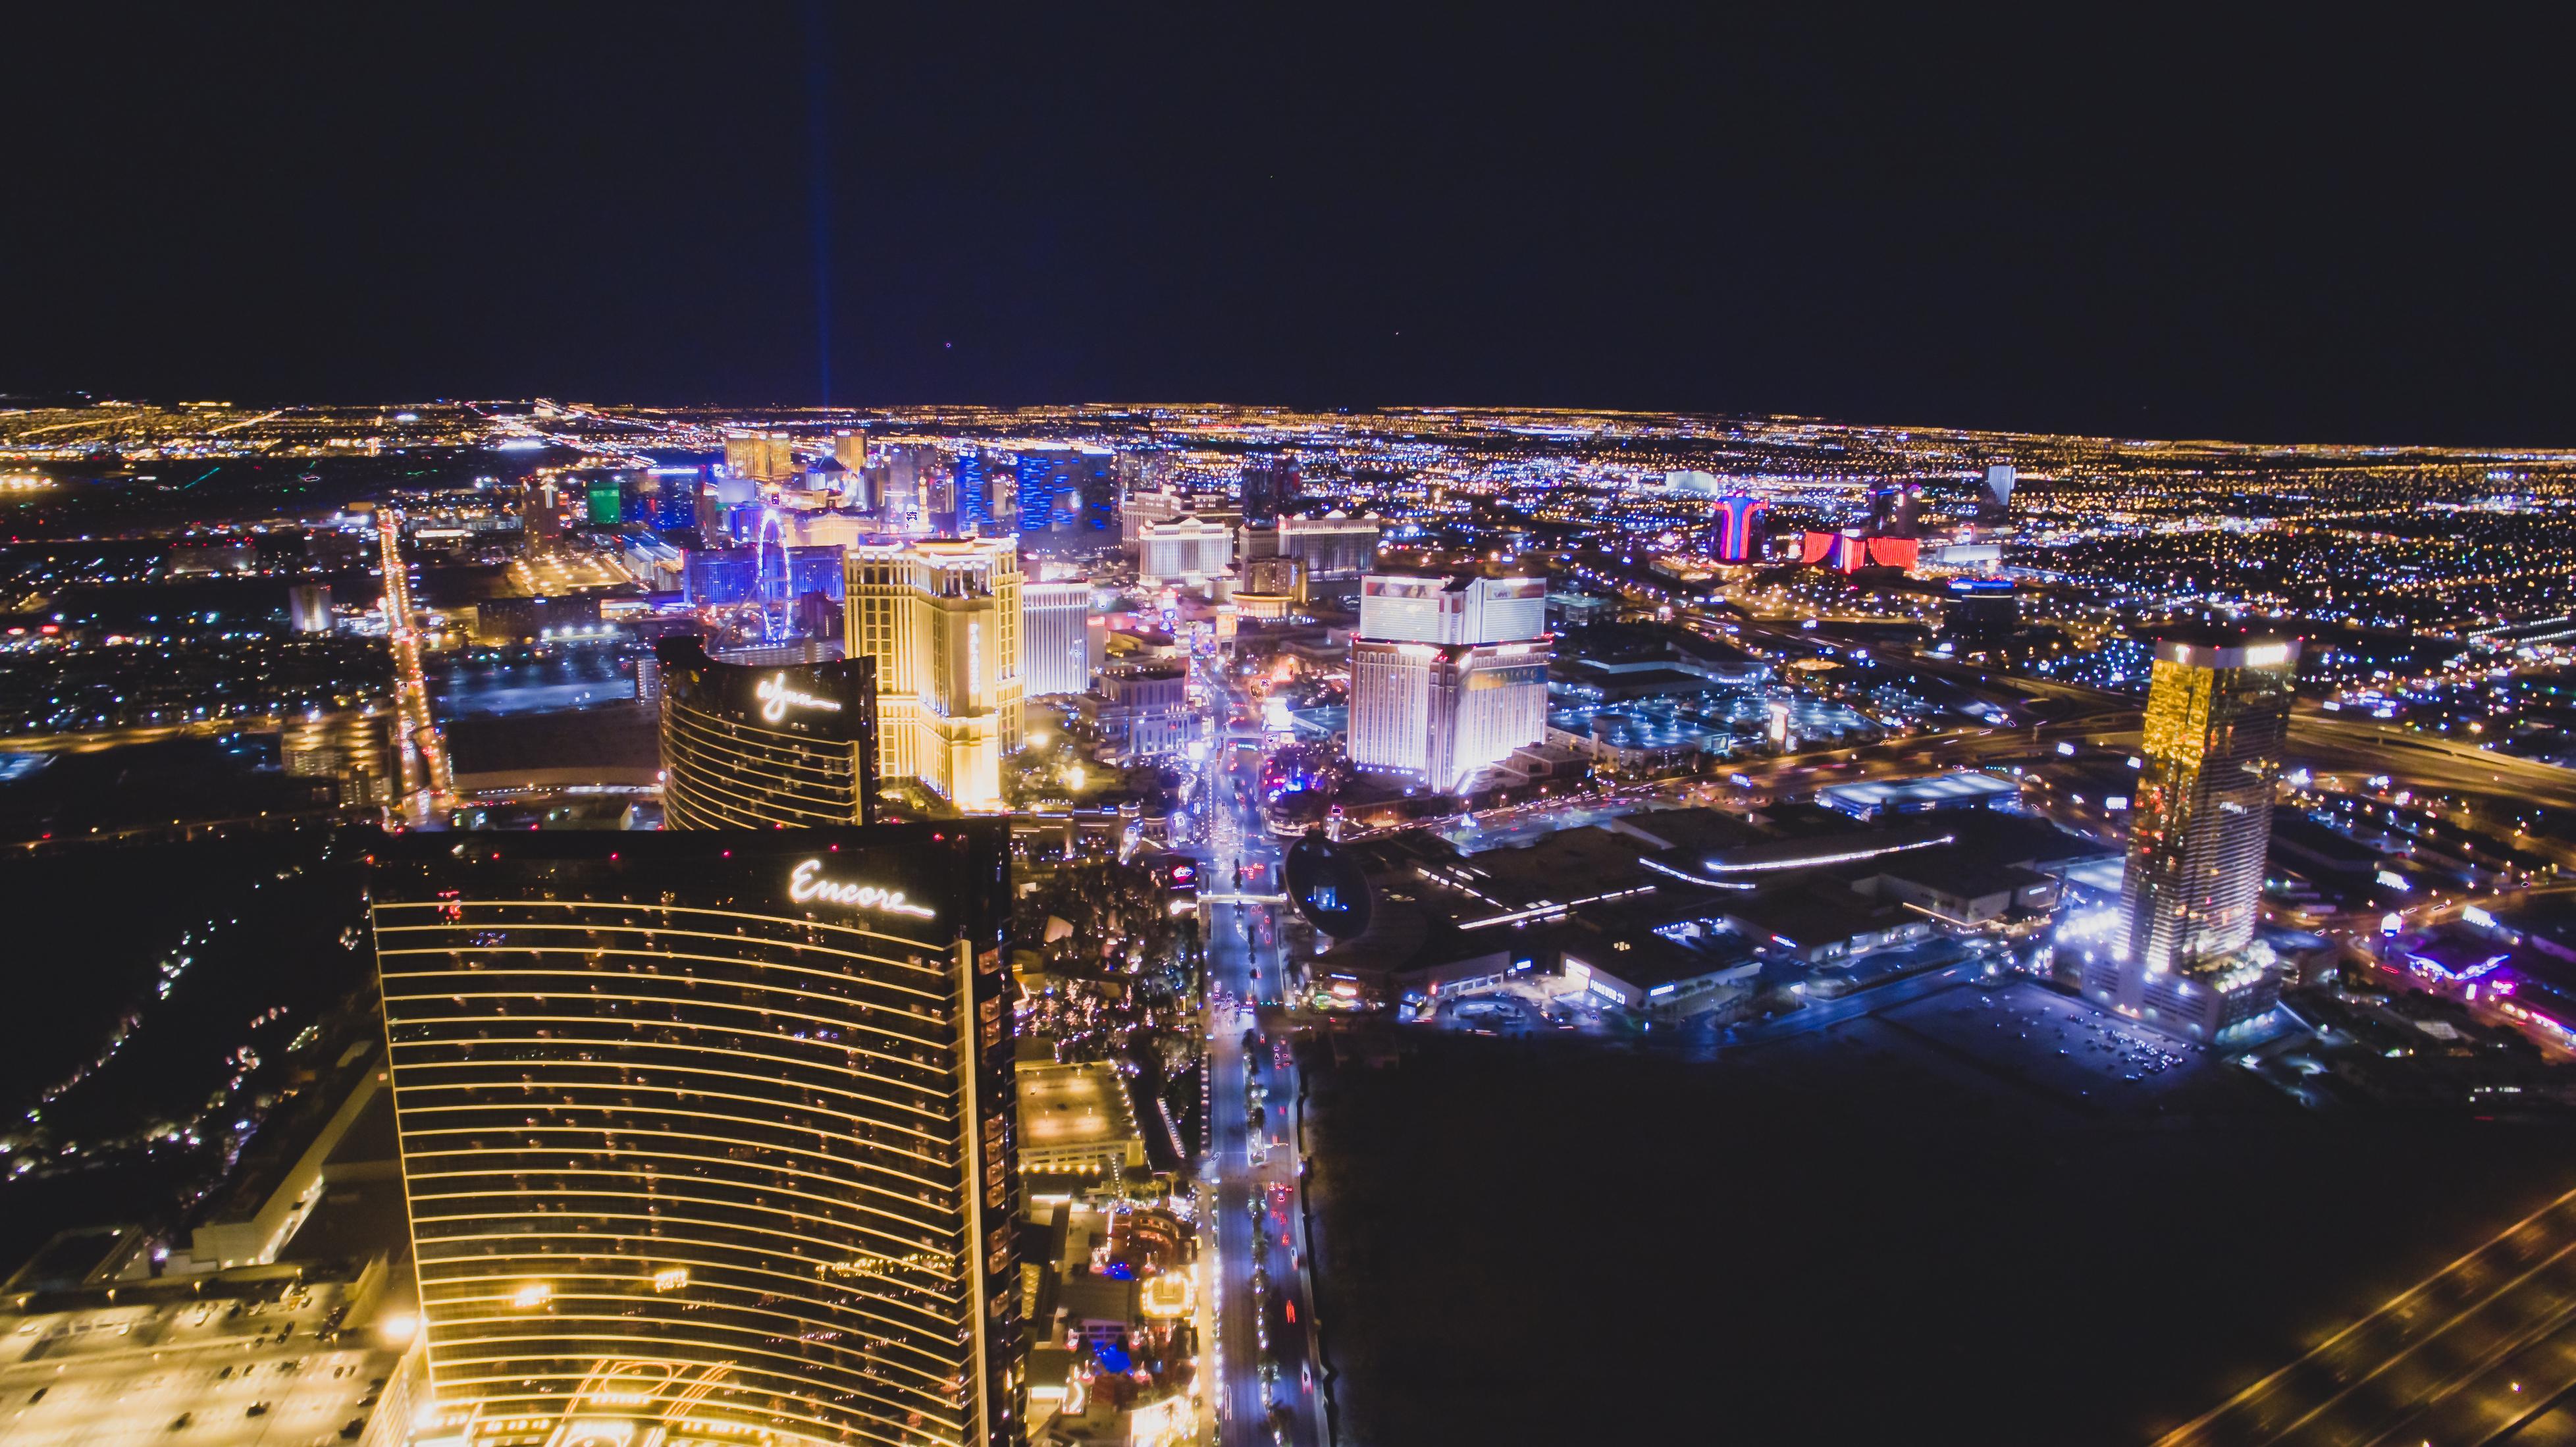 Aerial View Of The Las Vegas Strip At Night